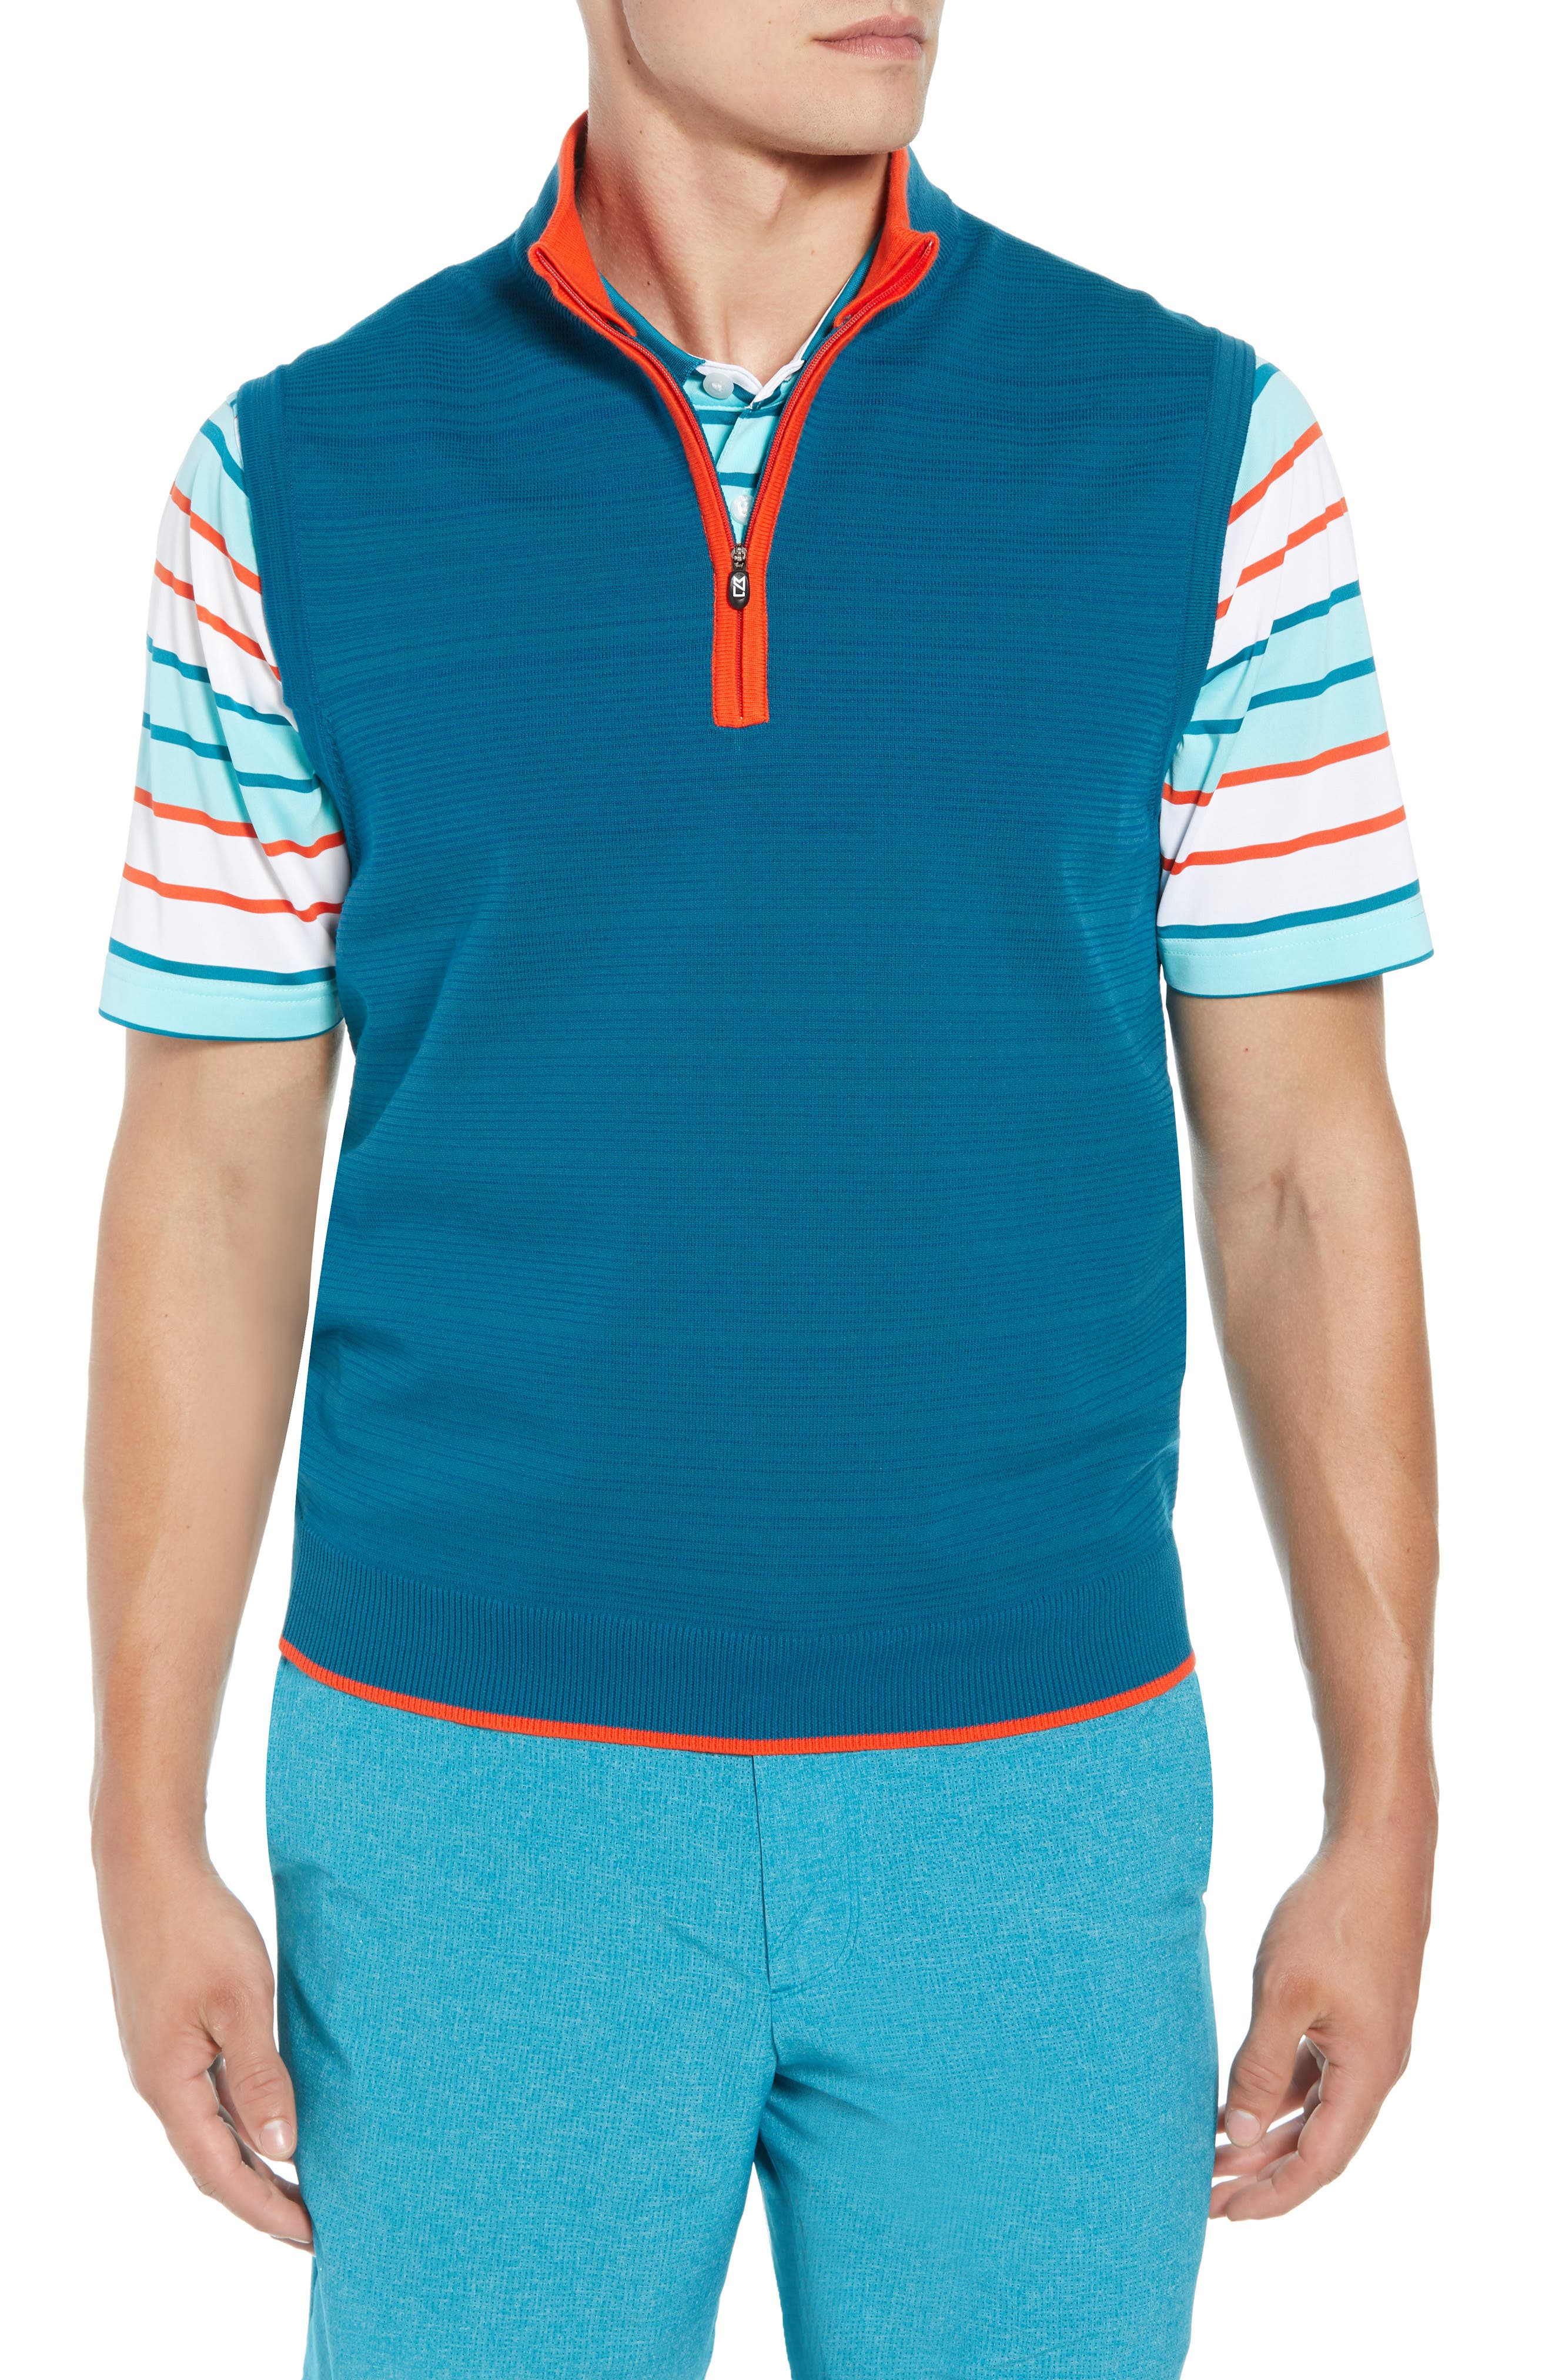 CUTTER & BUCK Impact Half Zip Sweater Vest, Main, color, 400